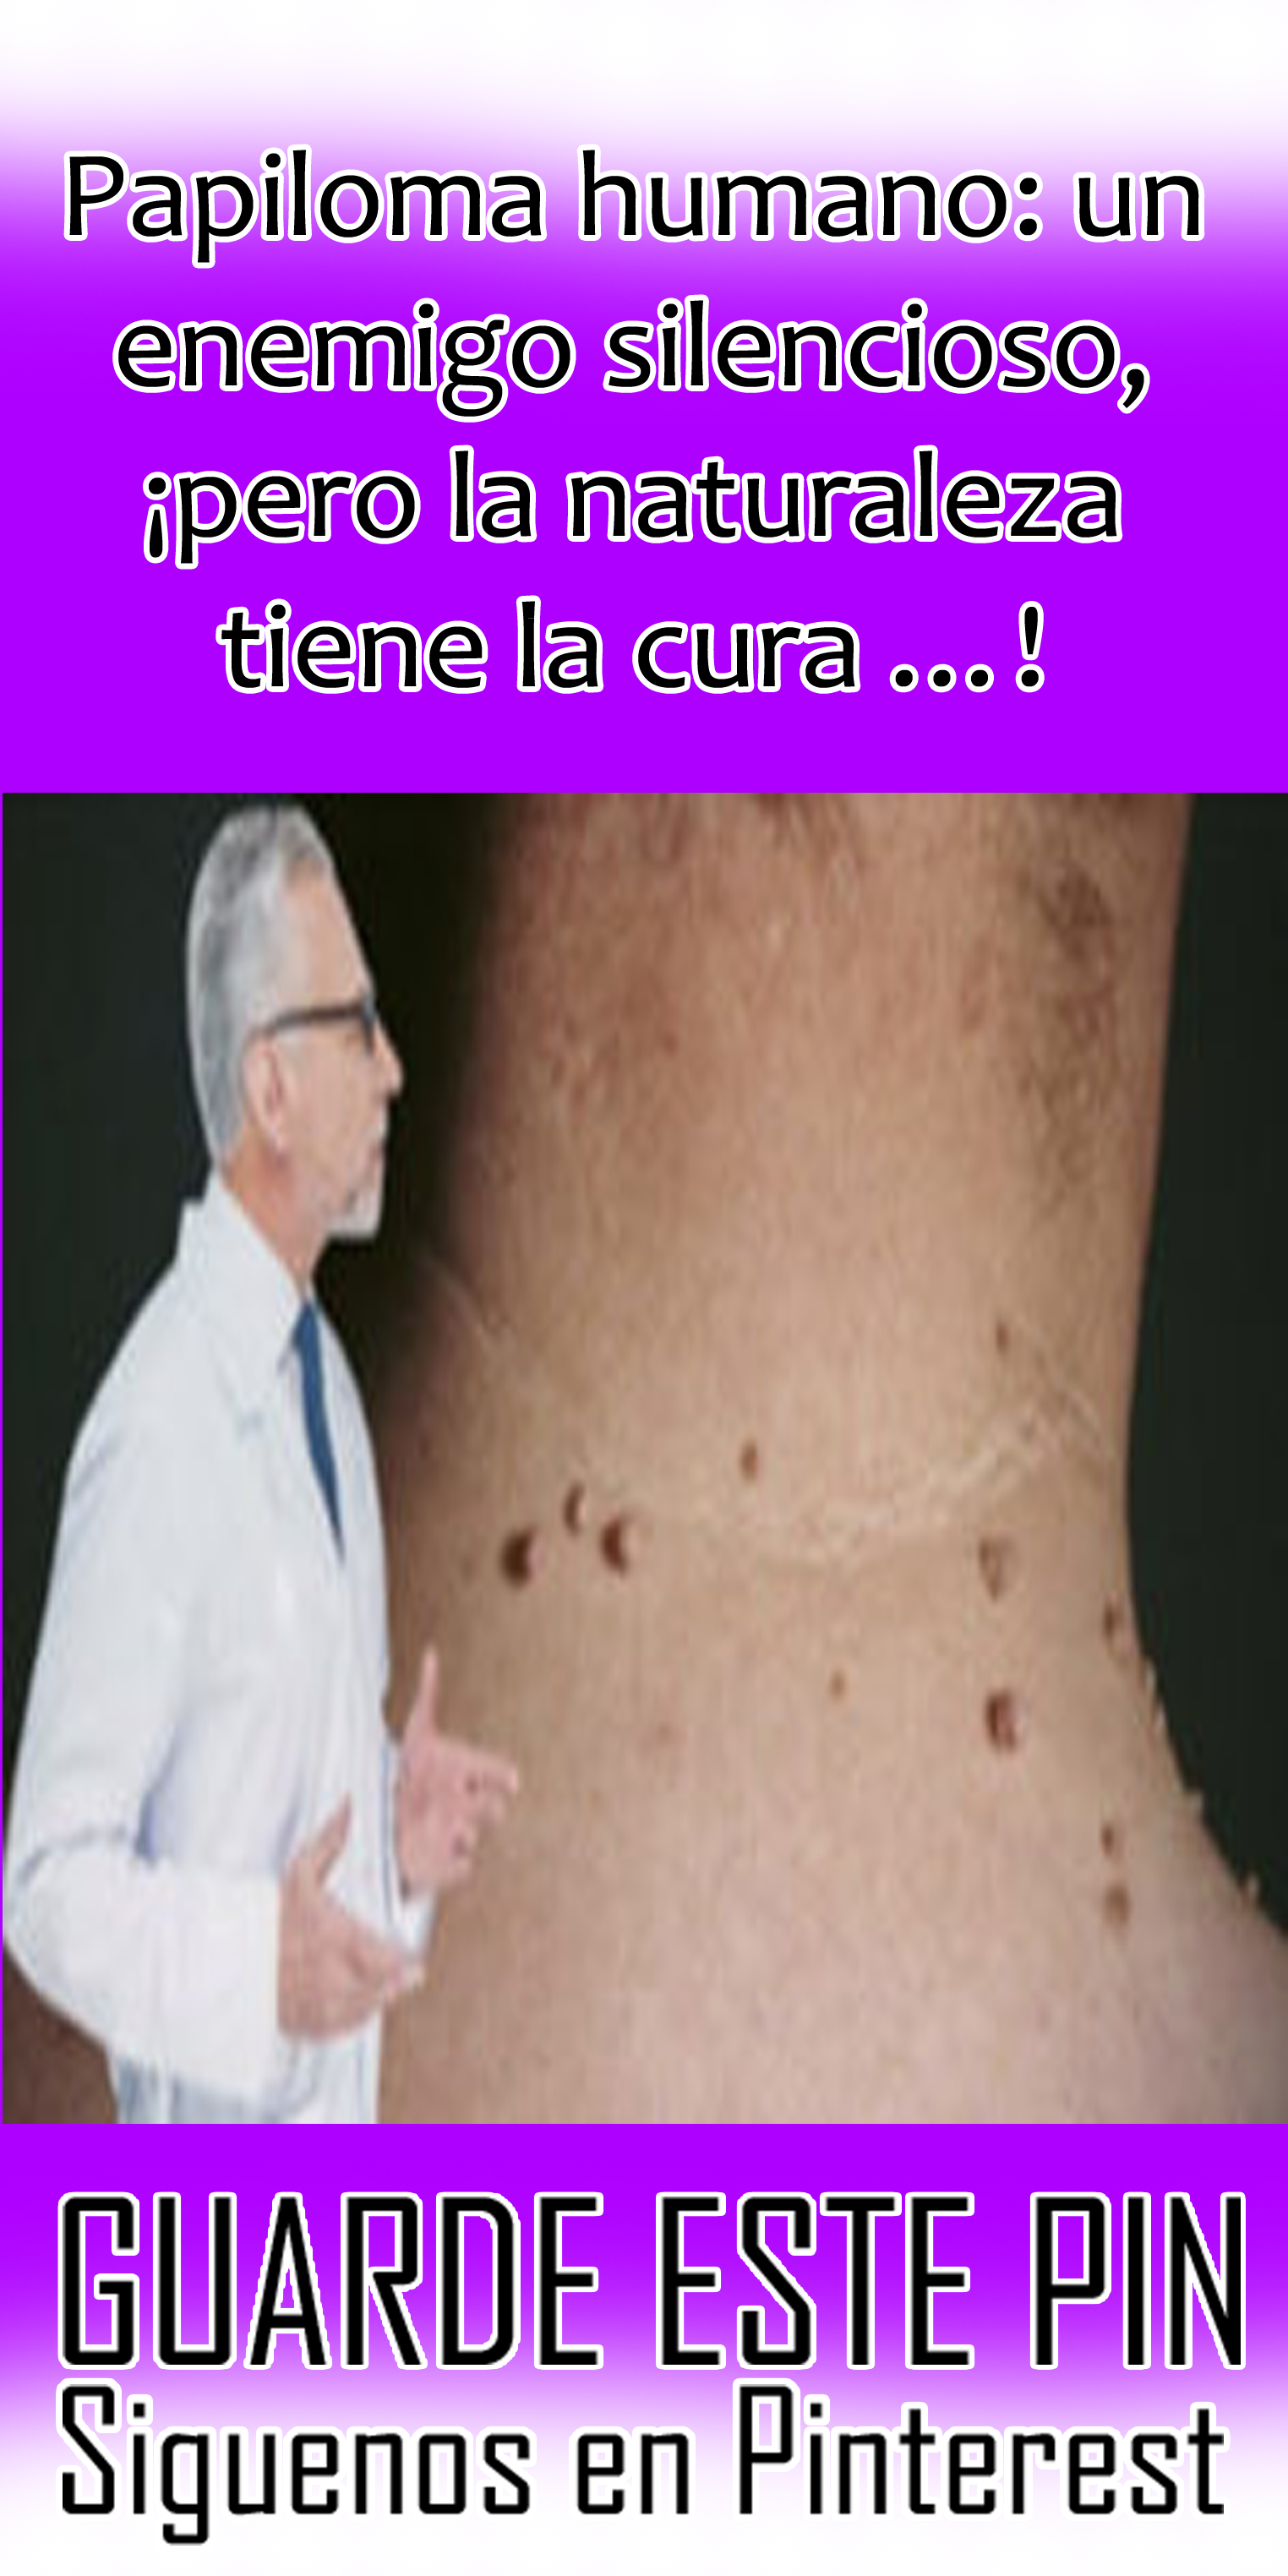 papiloma no tiene cura virus del papiloma humano cancer de ano